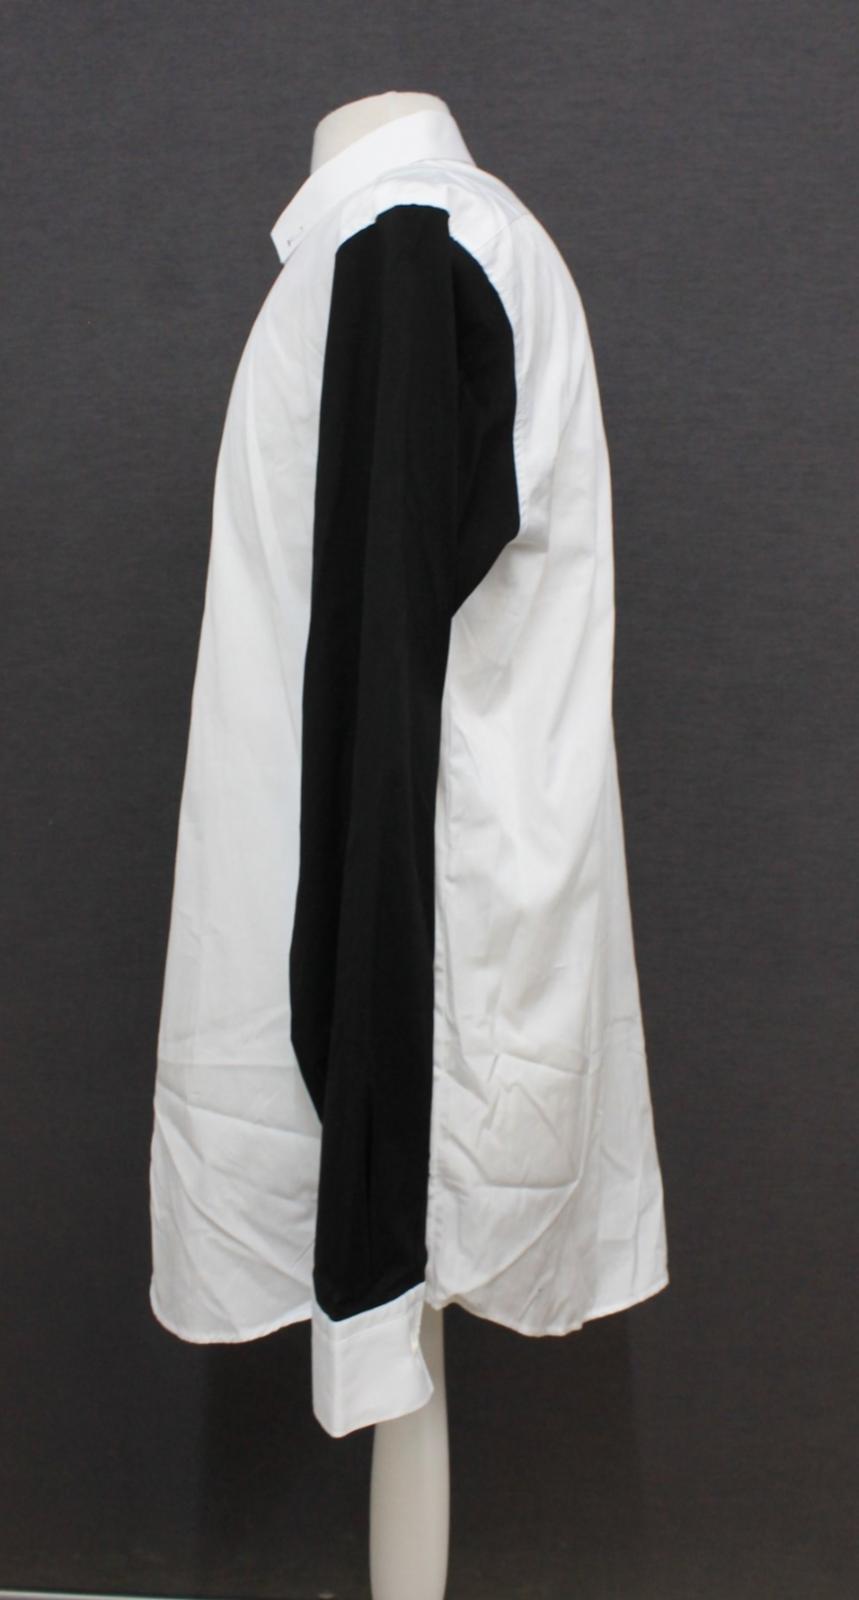 Neil-Barrett-Hombre-Blanco-De-Algodon-Manga-Negra-lo-que-el-F-Con-Cuello-Camisa-17-034 miniatura 6